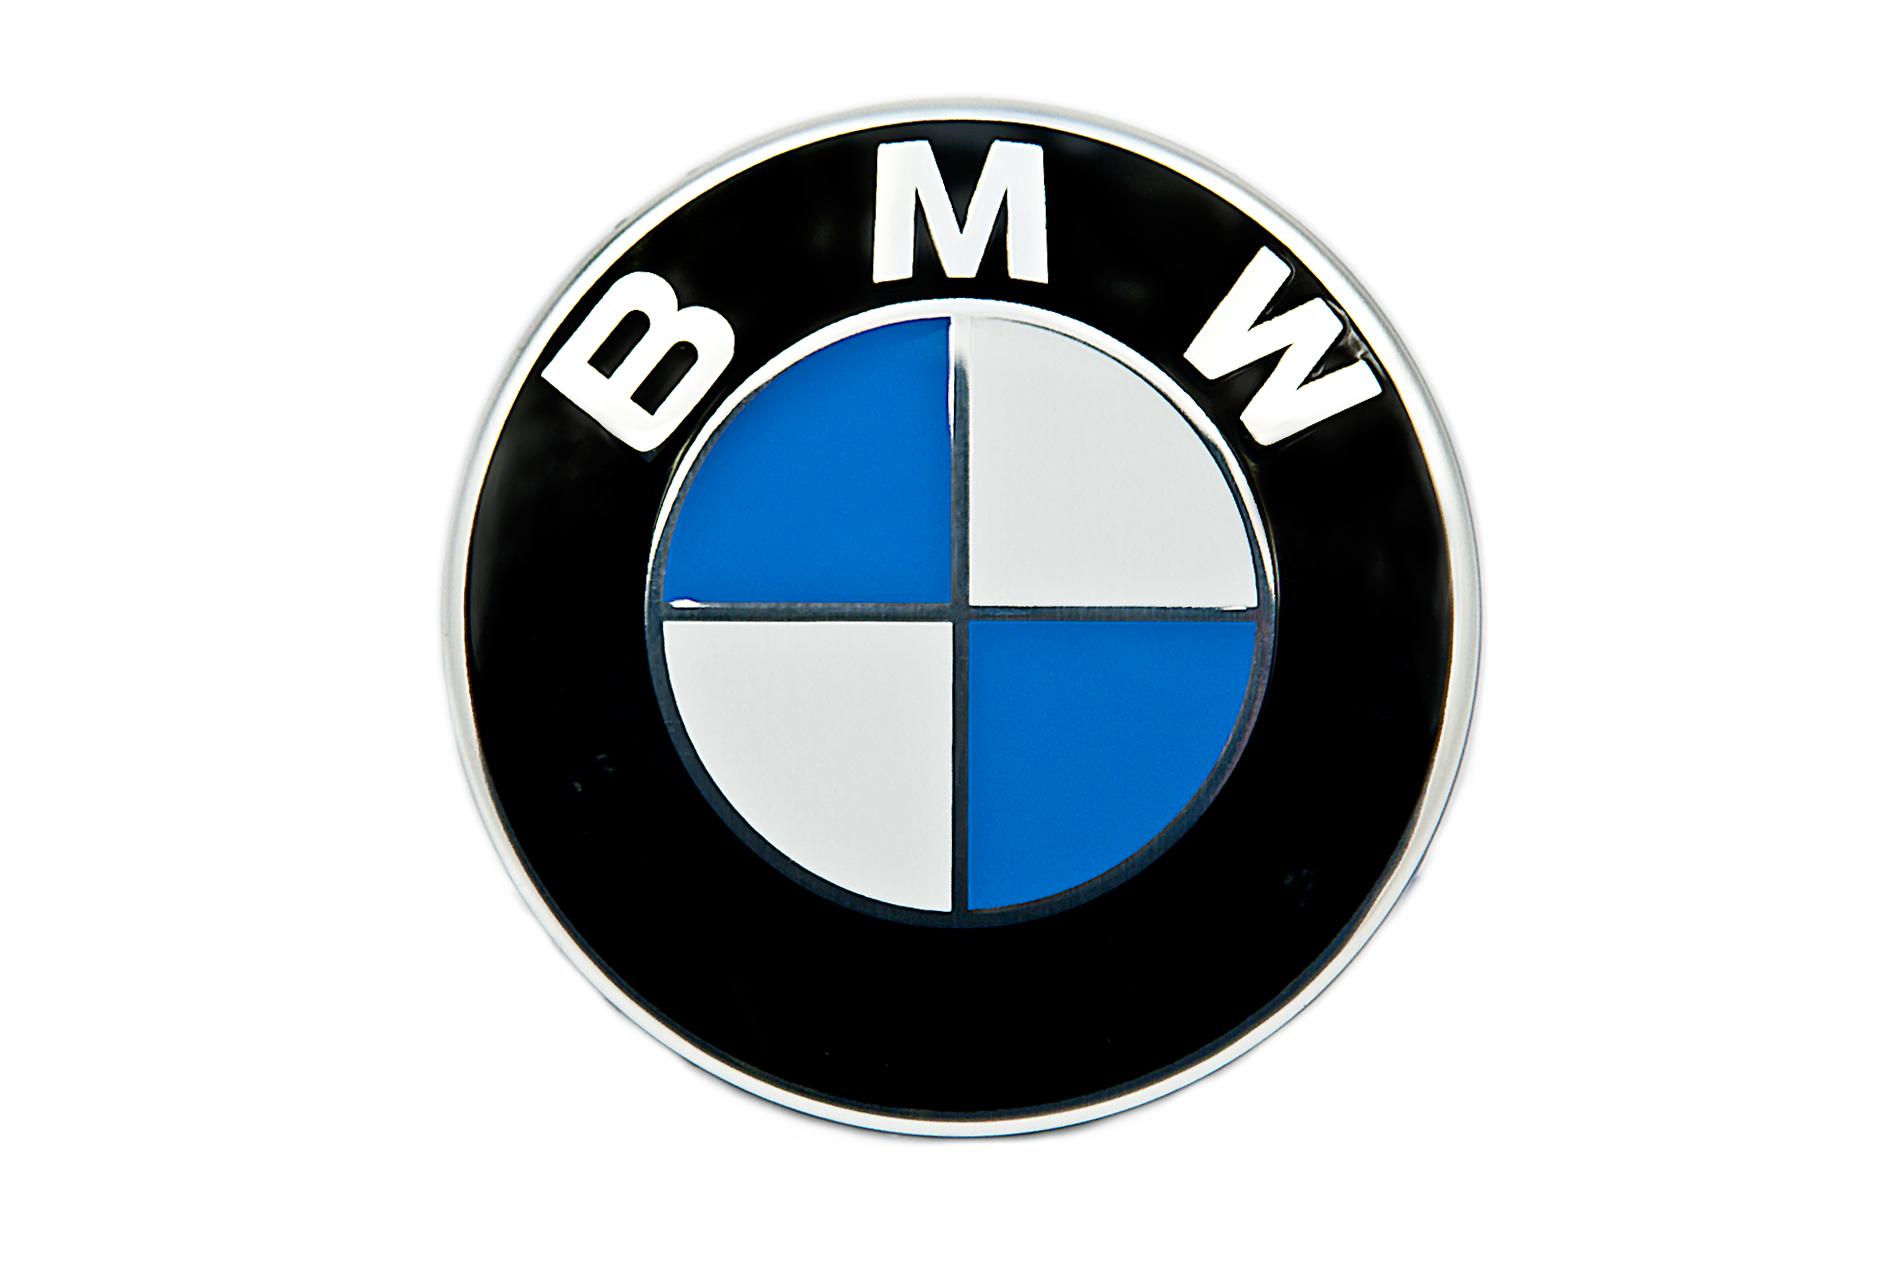 [SCHEMATICS_43NM]  BMW Service & Repair Manuals - Wiring Diagrams | 95 Bmw Iseries Wiring Diagrams |  | Automotive manuals - Wiring Diagrams